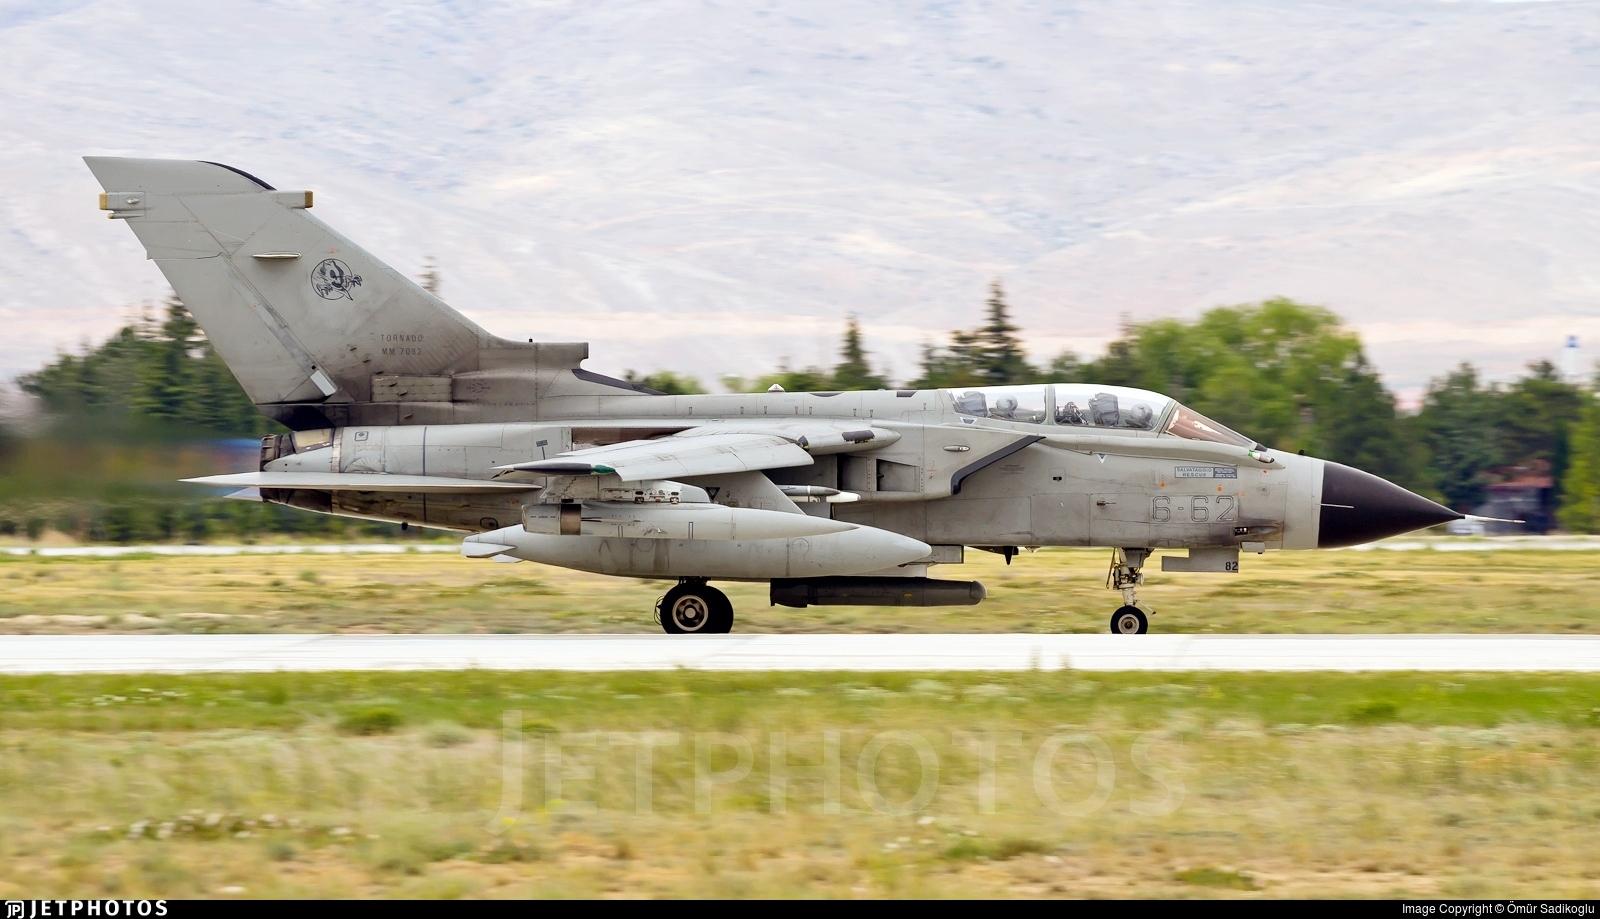 MM7082 - Panavia Tornado IDS - Italy - Air Force